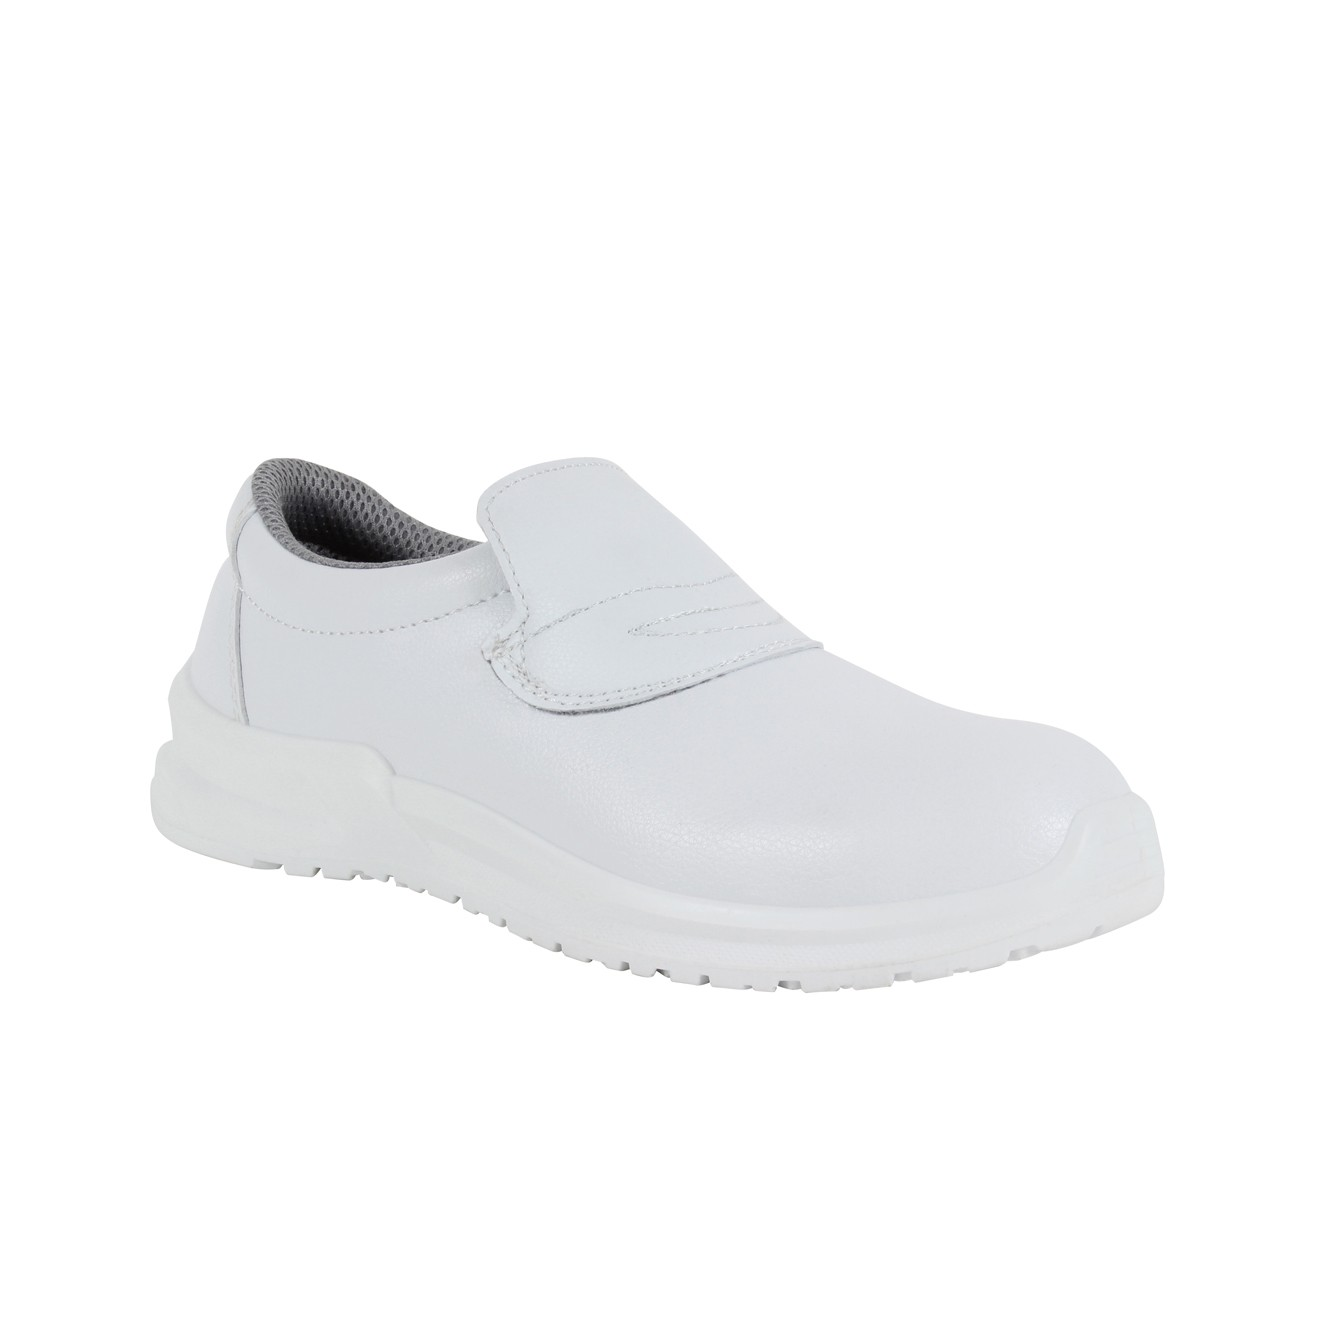 Hygiene Slip-On Shoe